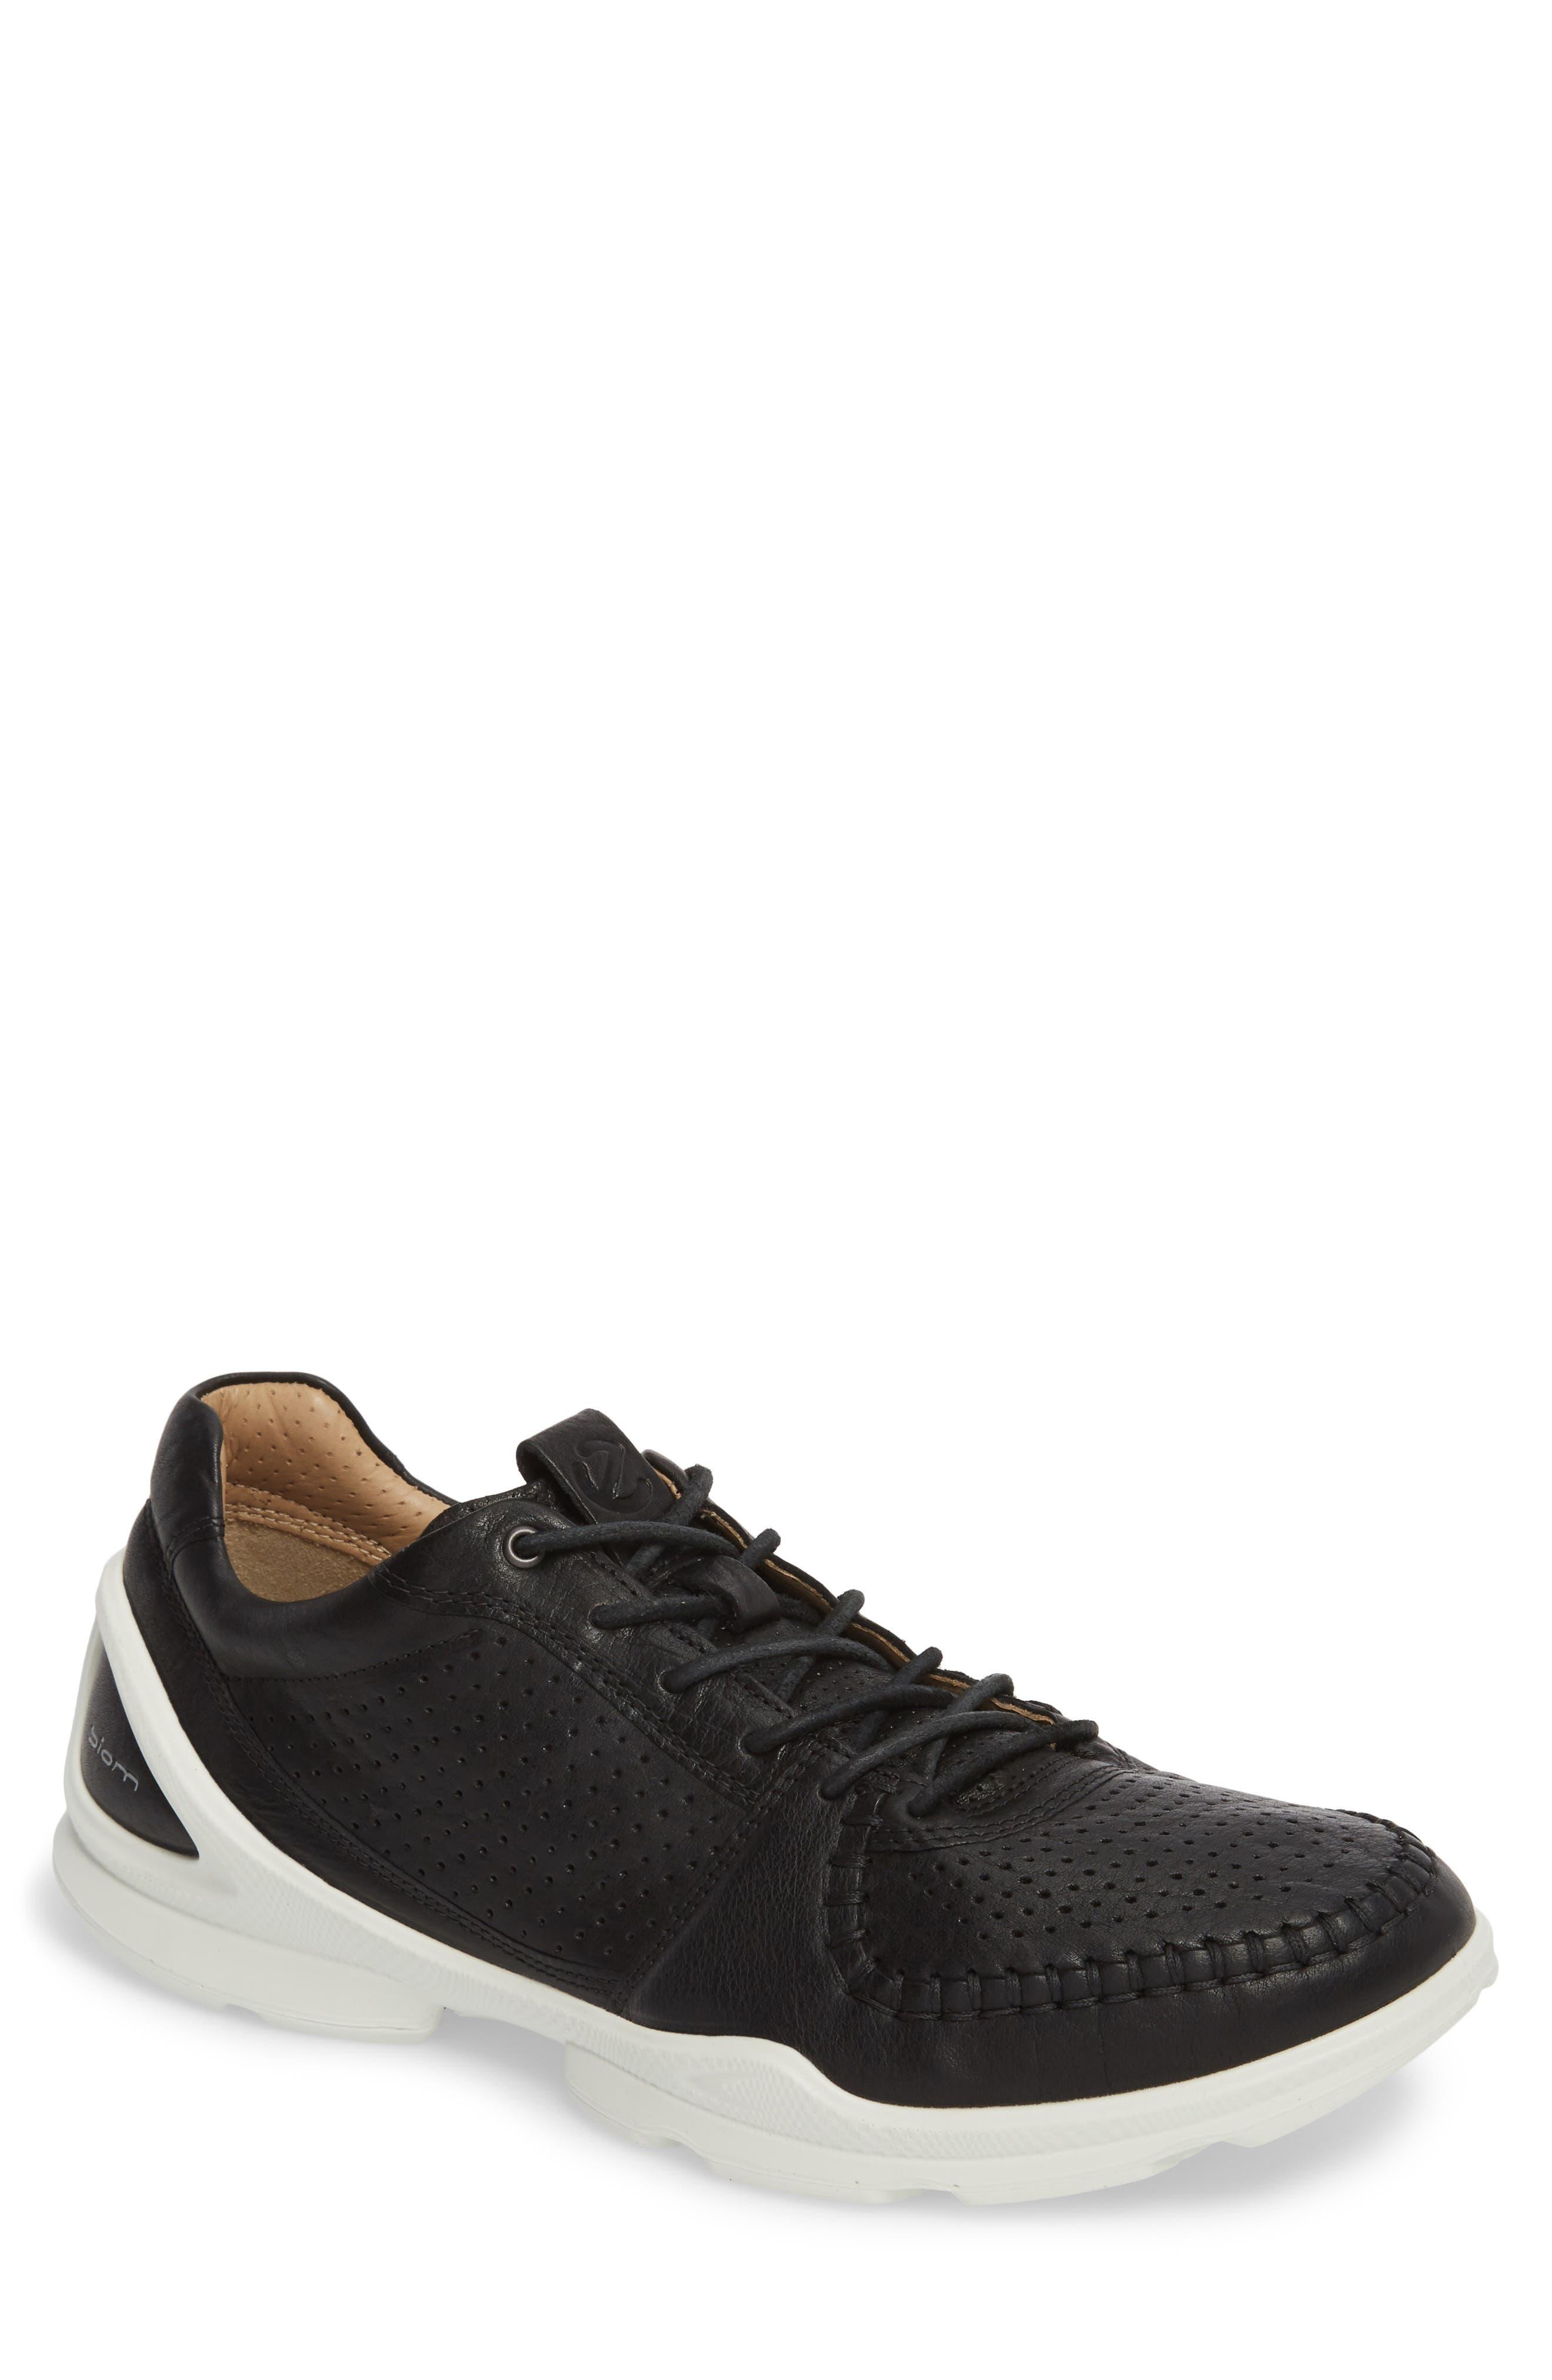 BIOM Street Moc Toe Sneaker,                             Main thumbnail 1, color,                             008